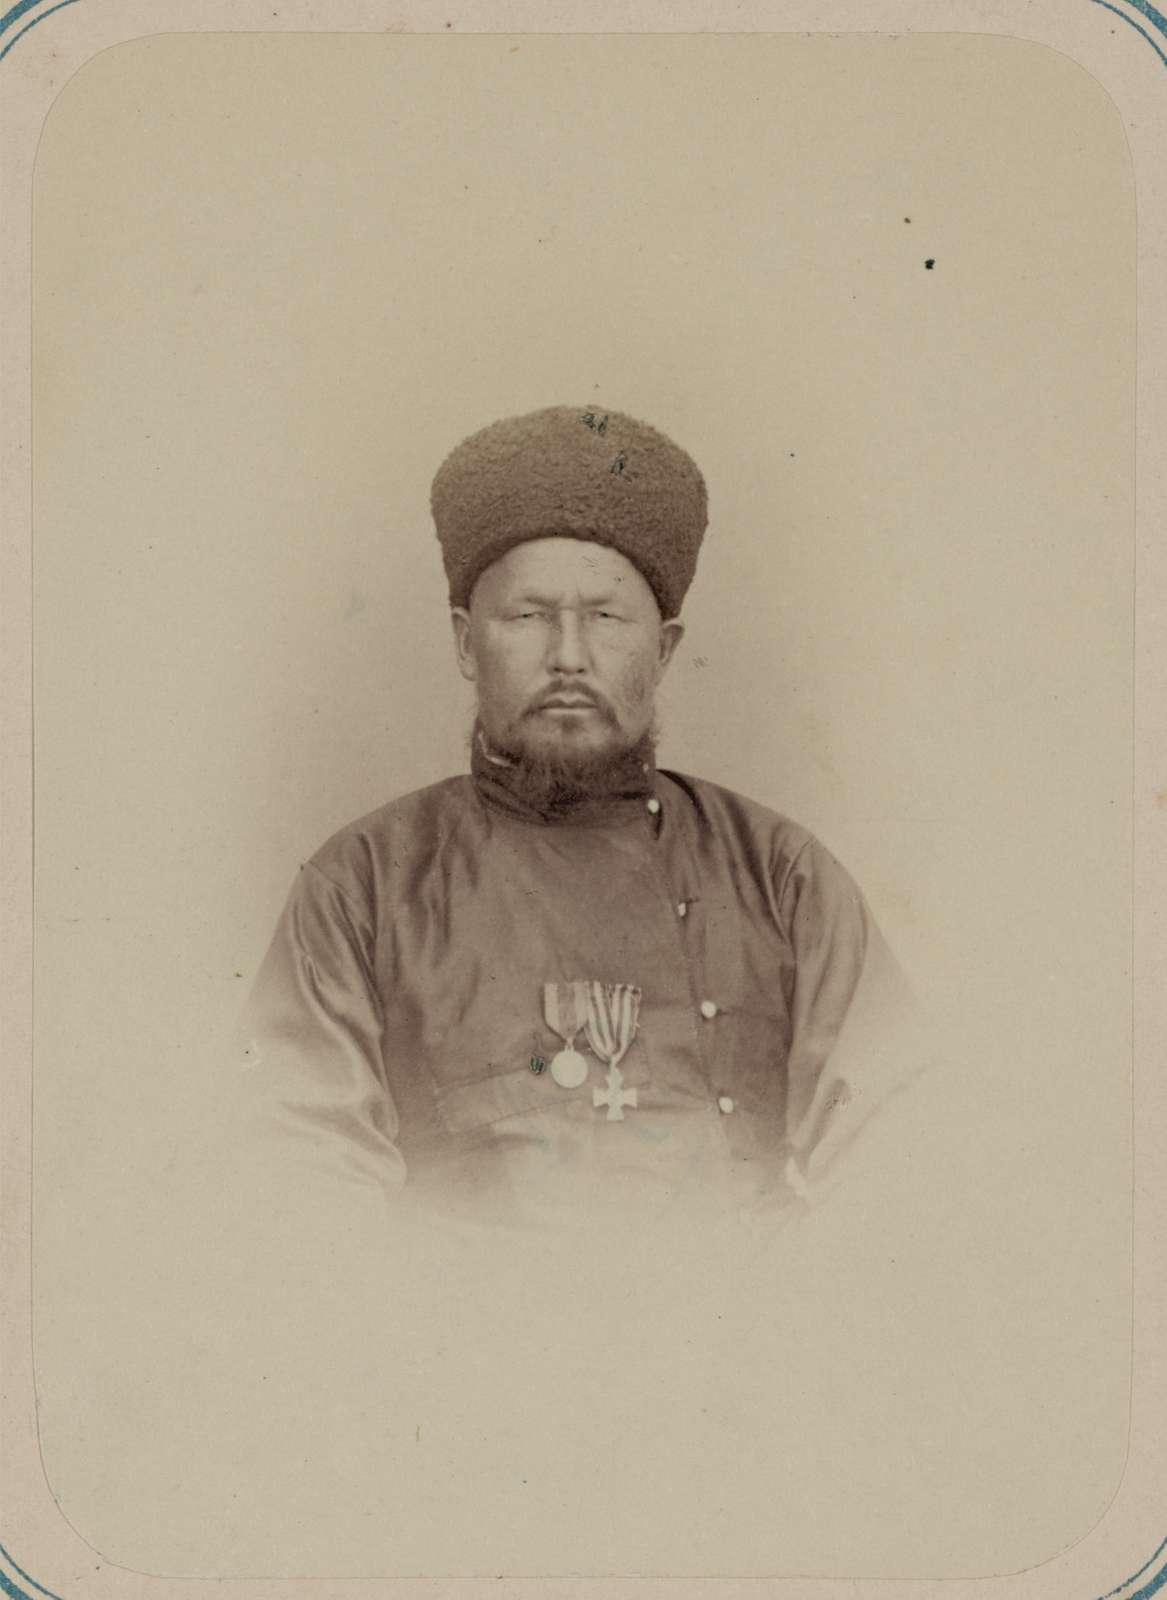 Georgievskie kavalery imieiushchie znaki otlichiia voennago ordena. Za vziatie Ak-Mecheti (forta perovskii) 22 Iiunia 1853 g. Kirgiz Safarov